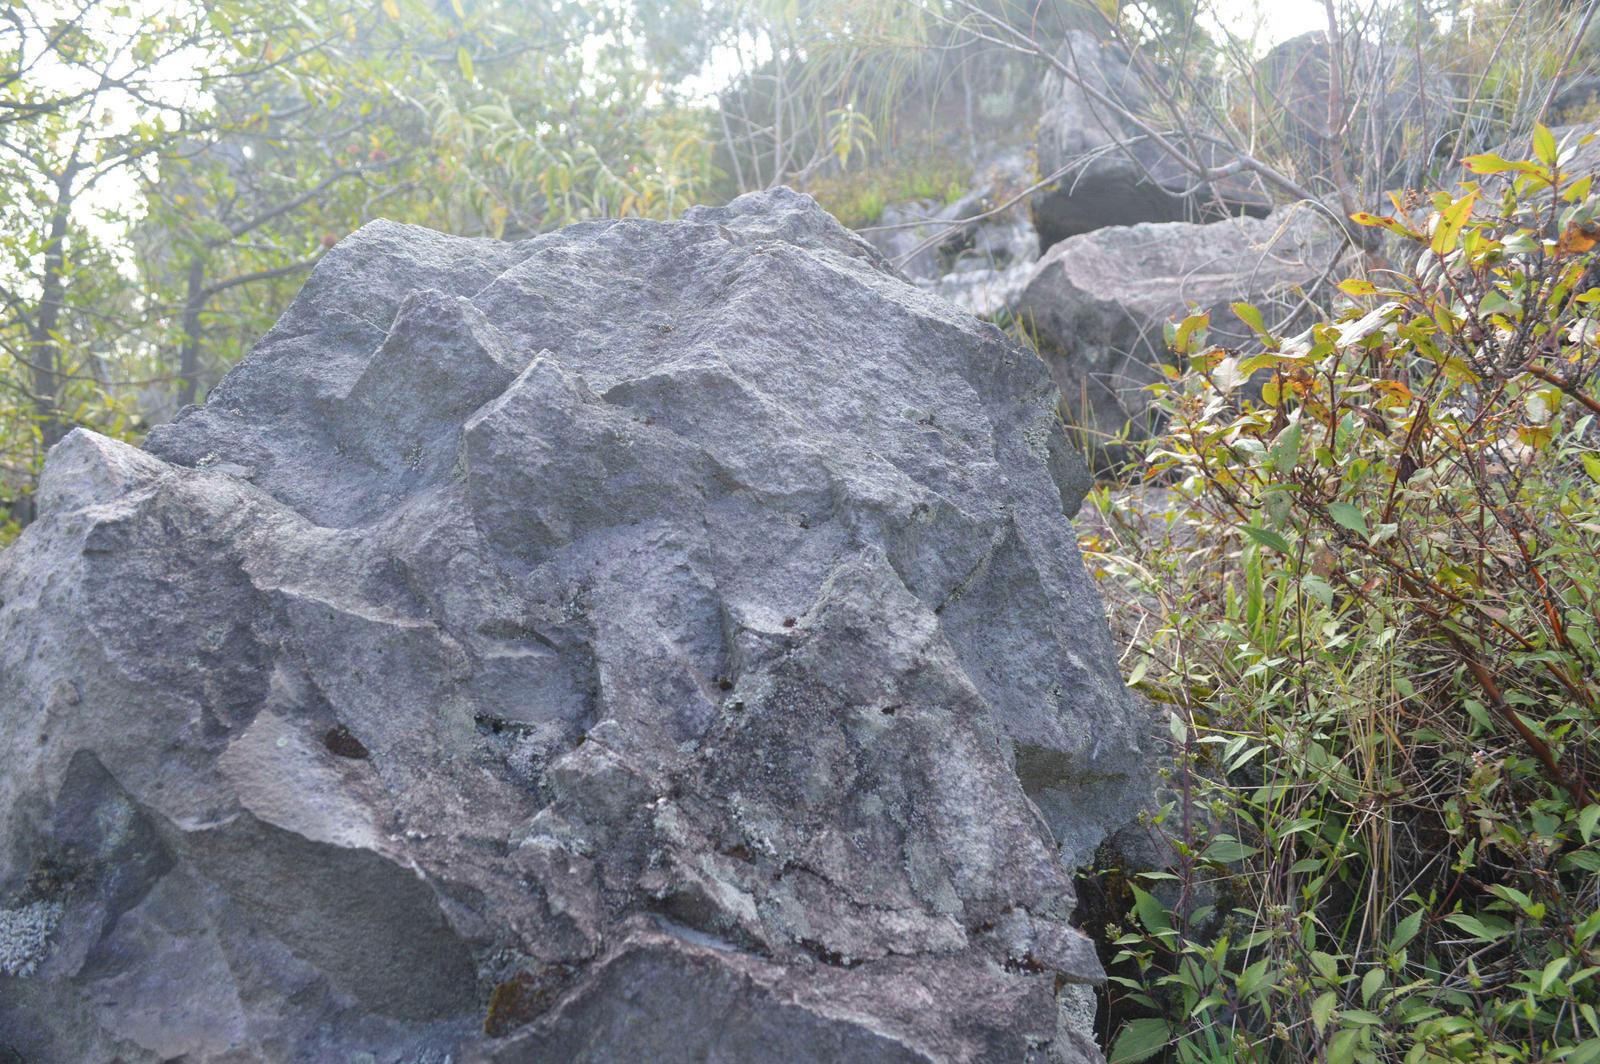 Stone2 By Adipancawh